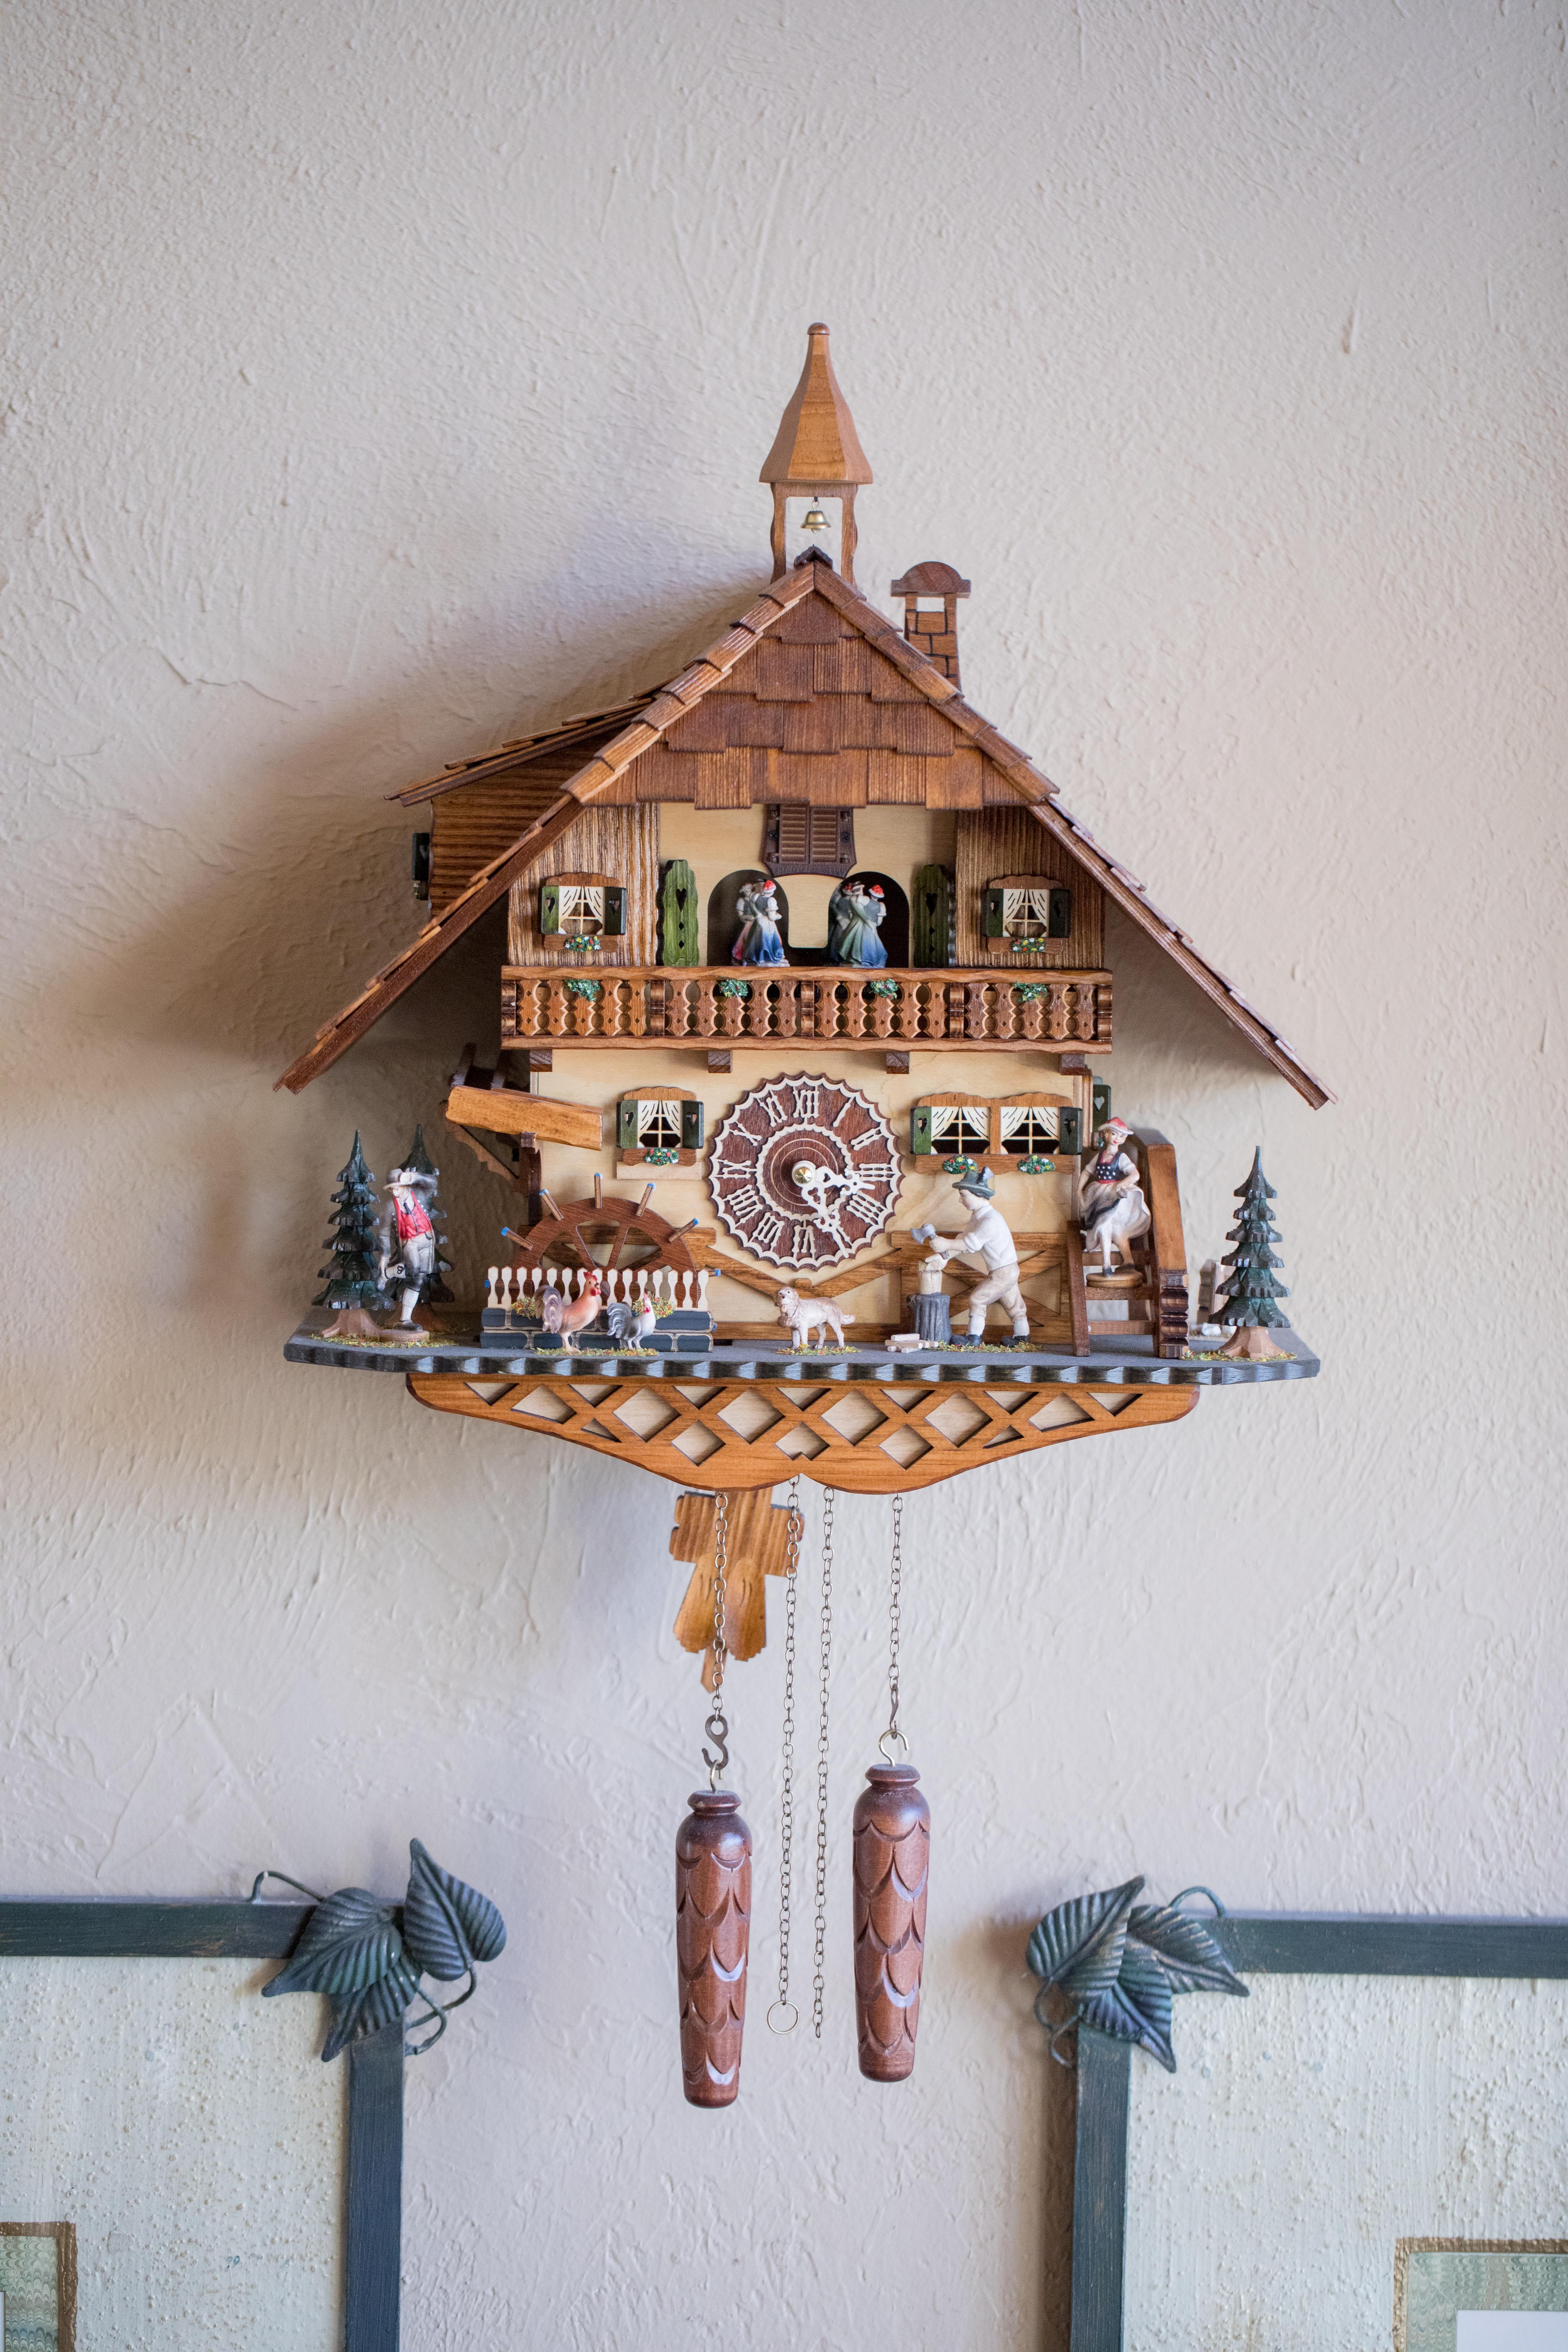 Private-Home-Rental-Wedding-VRBO-Fall-Breckenridge-Colorado-Bride-and-Groom-Clock